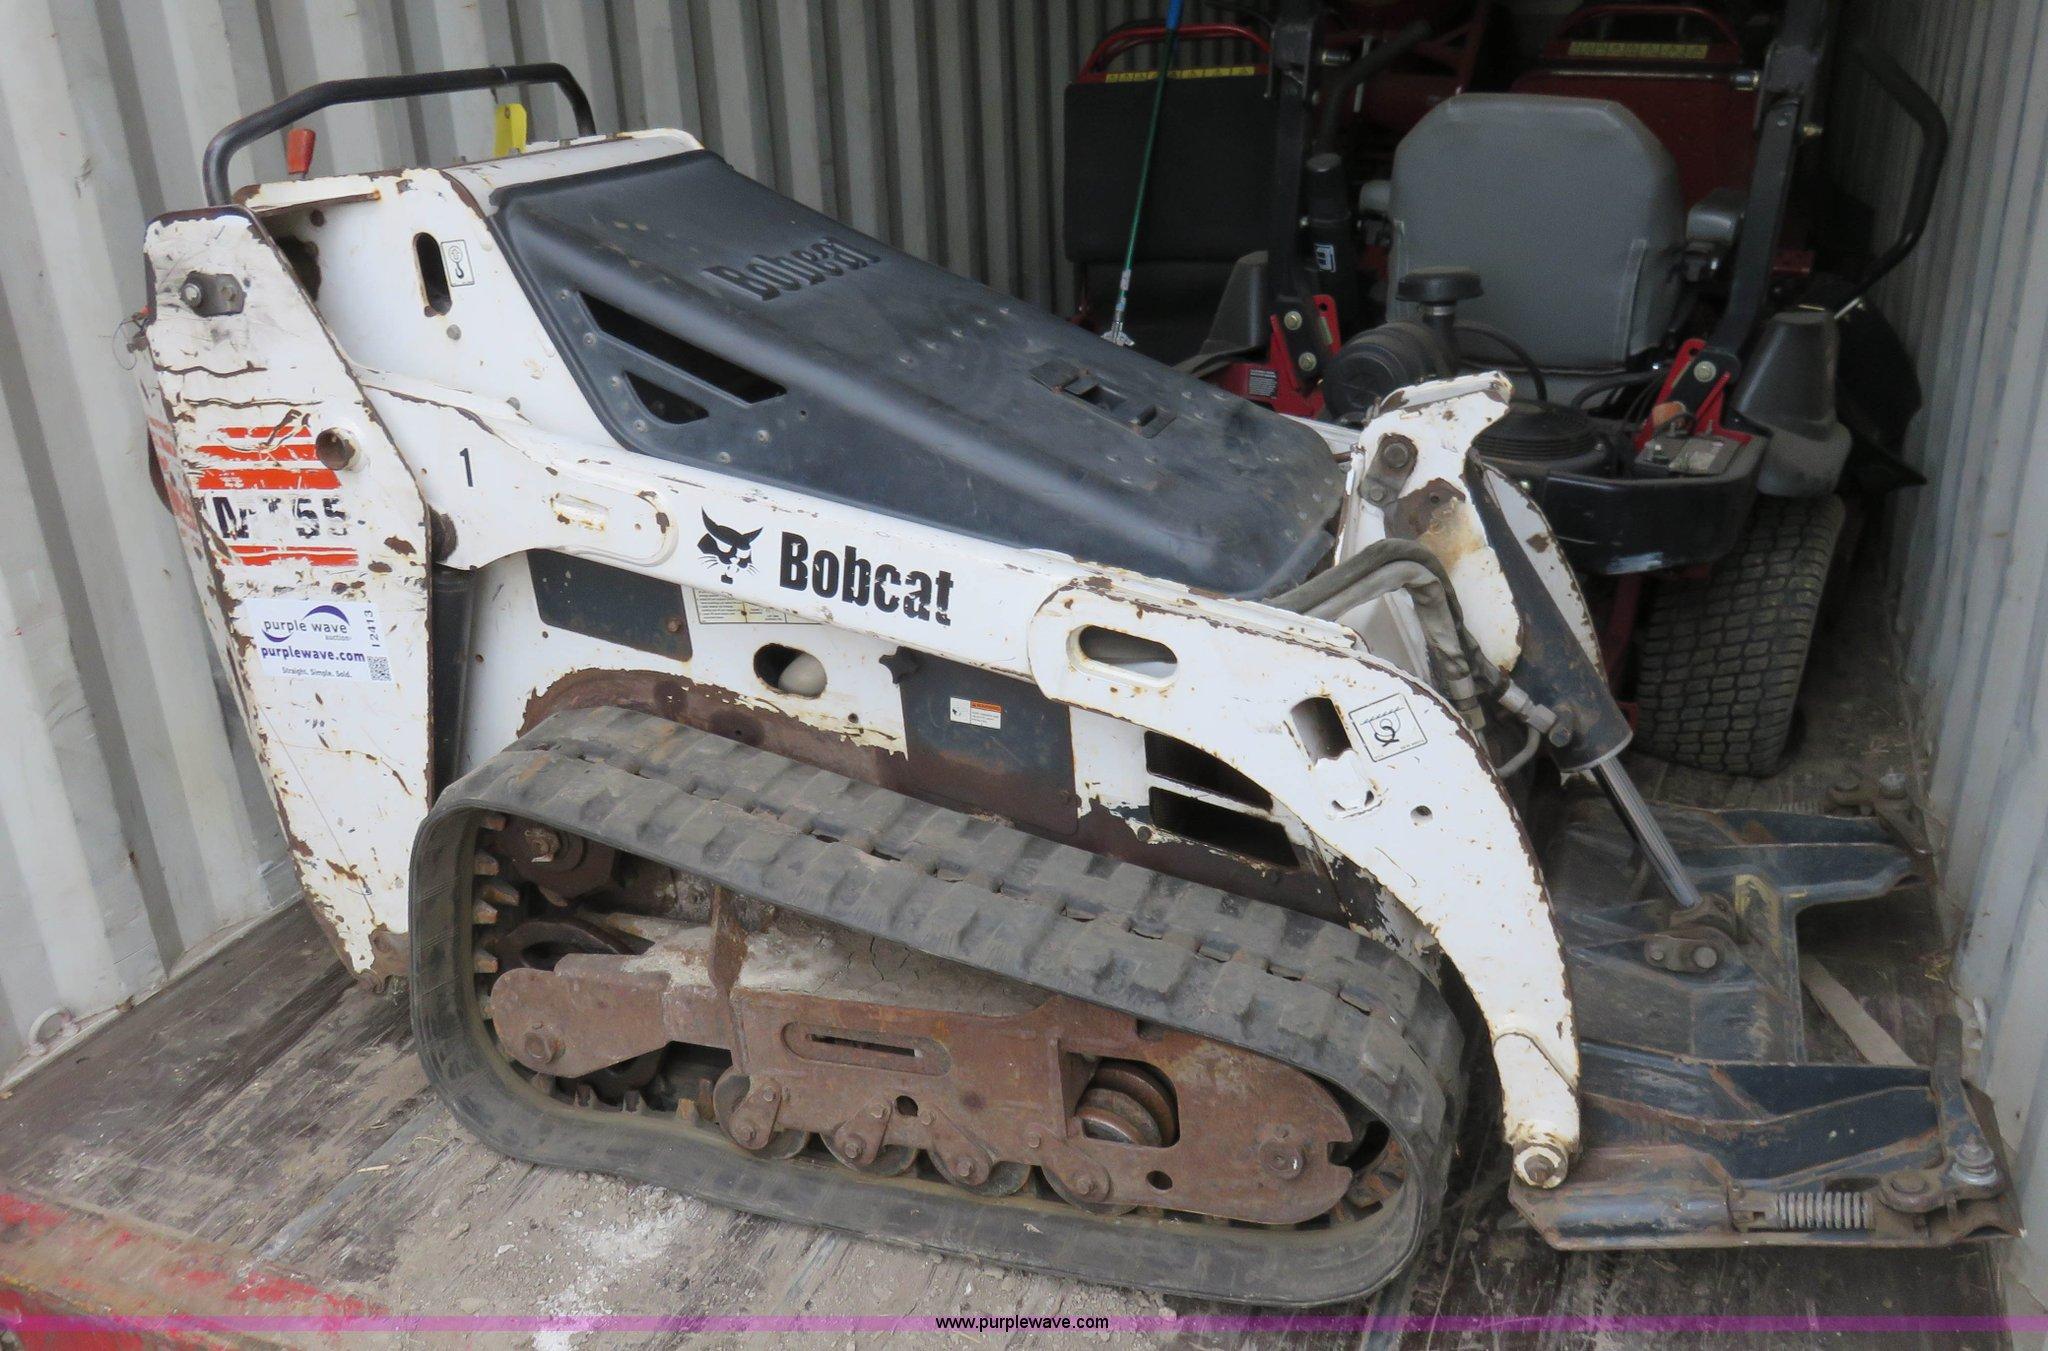 Bobcat MT55 mini track loader | Item I2413 | SOLD! February